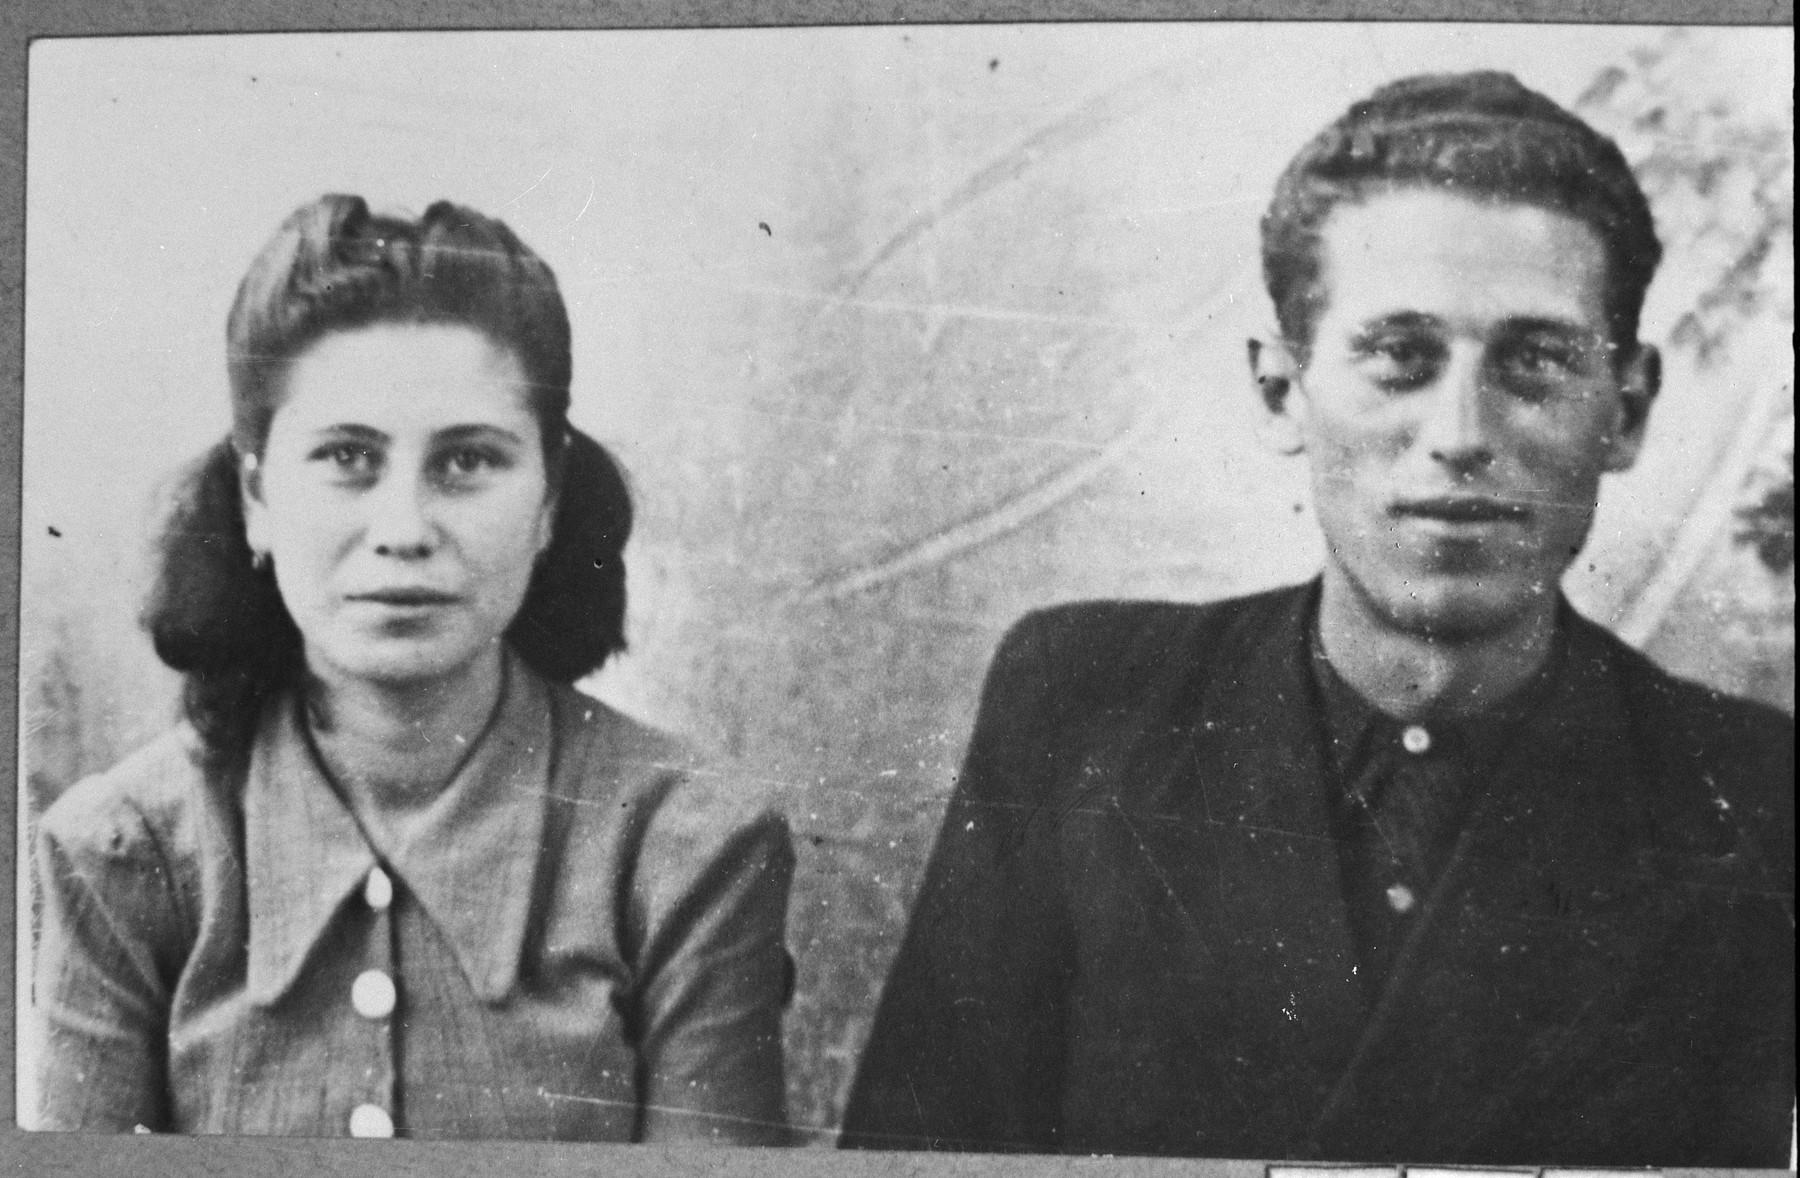 Portrait of Alberto Pardo, son of Santo Pardo and Matika Pardo, Santo's daughter.  They were students.  They lived at Karagoryeva 63 in Bitola.